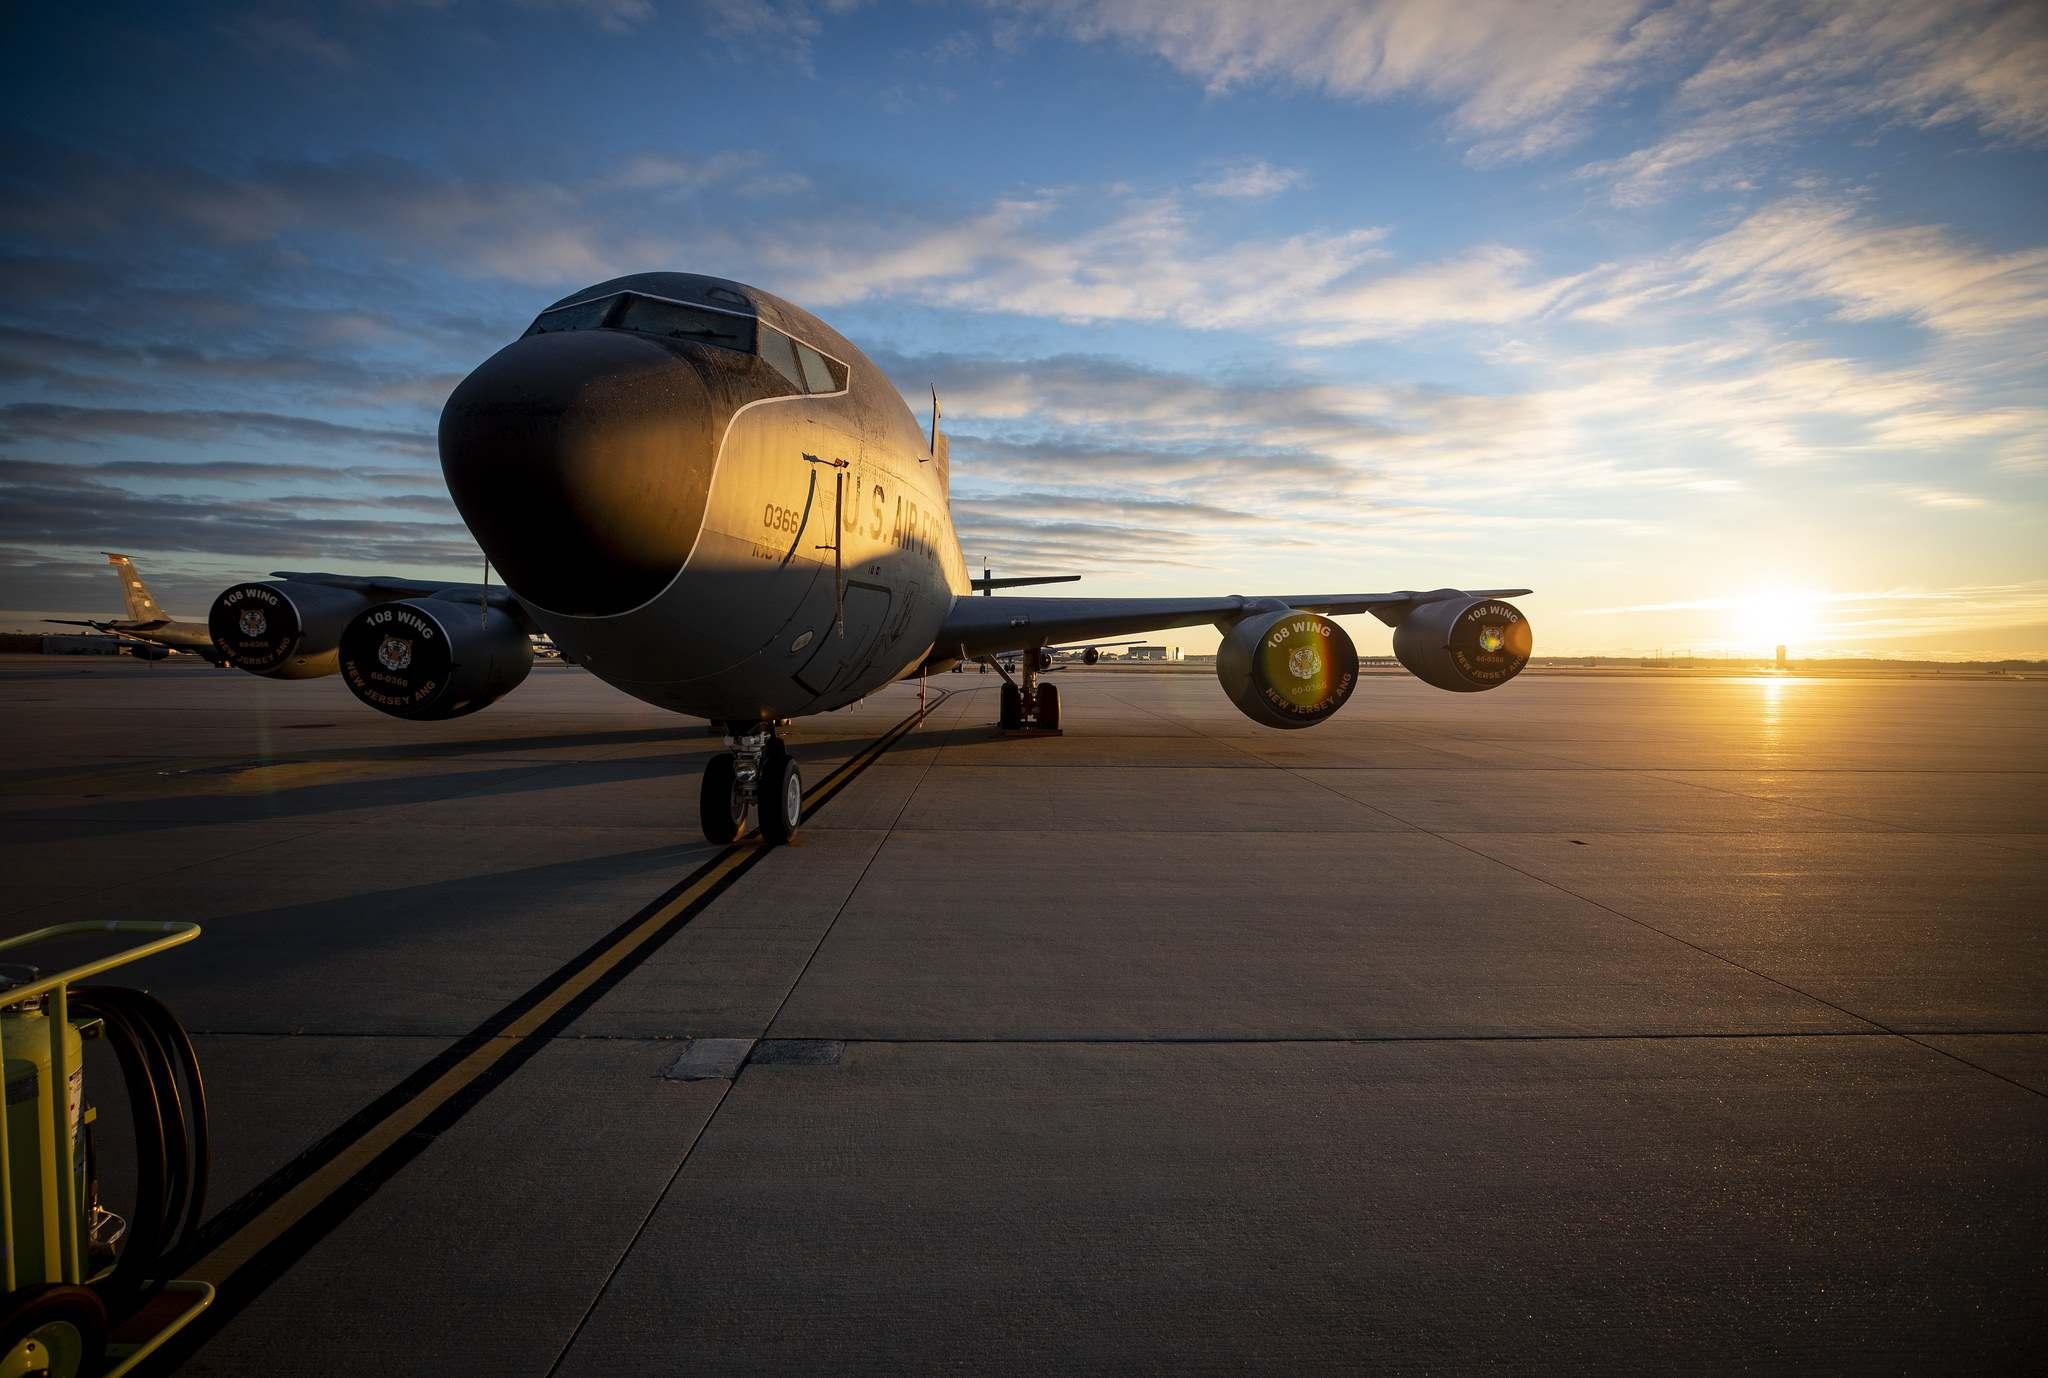 boeing kc 135 Boeing KC 135R Stratotanker Photos